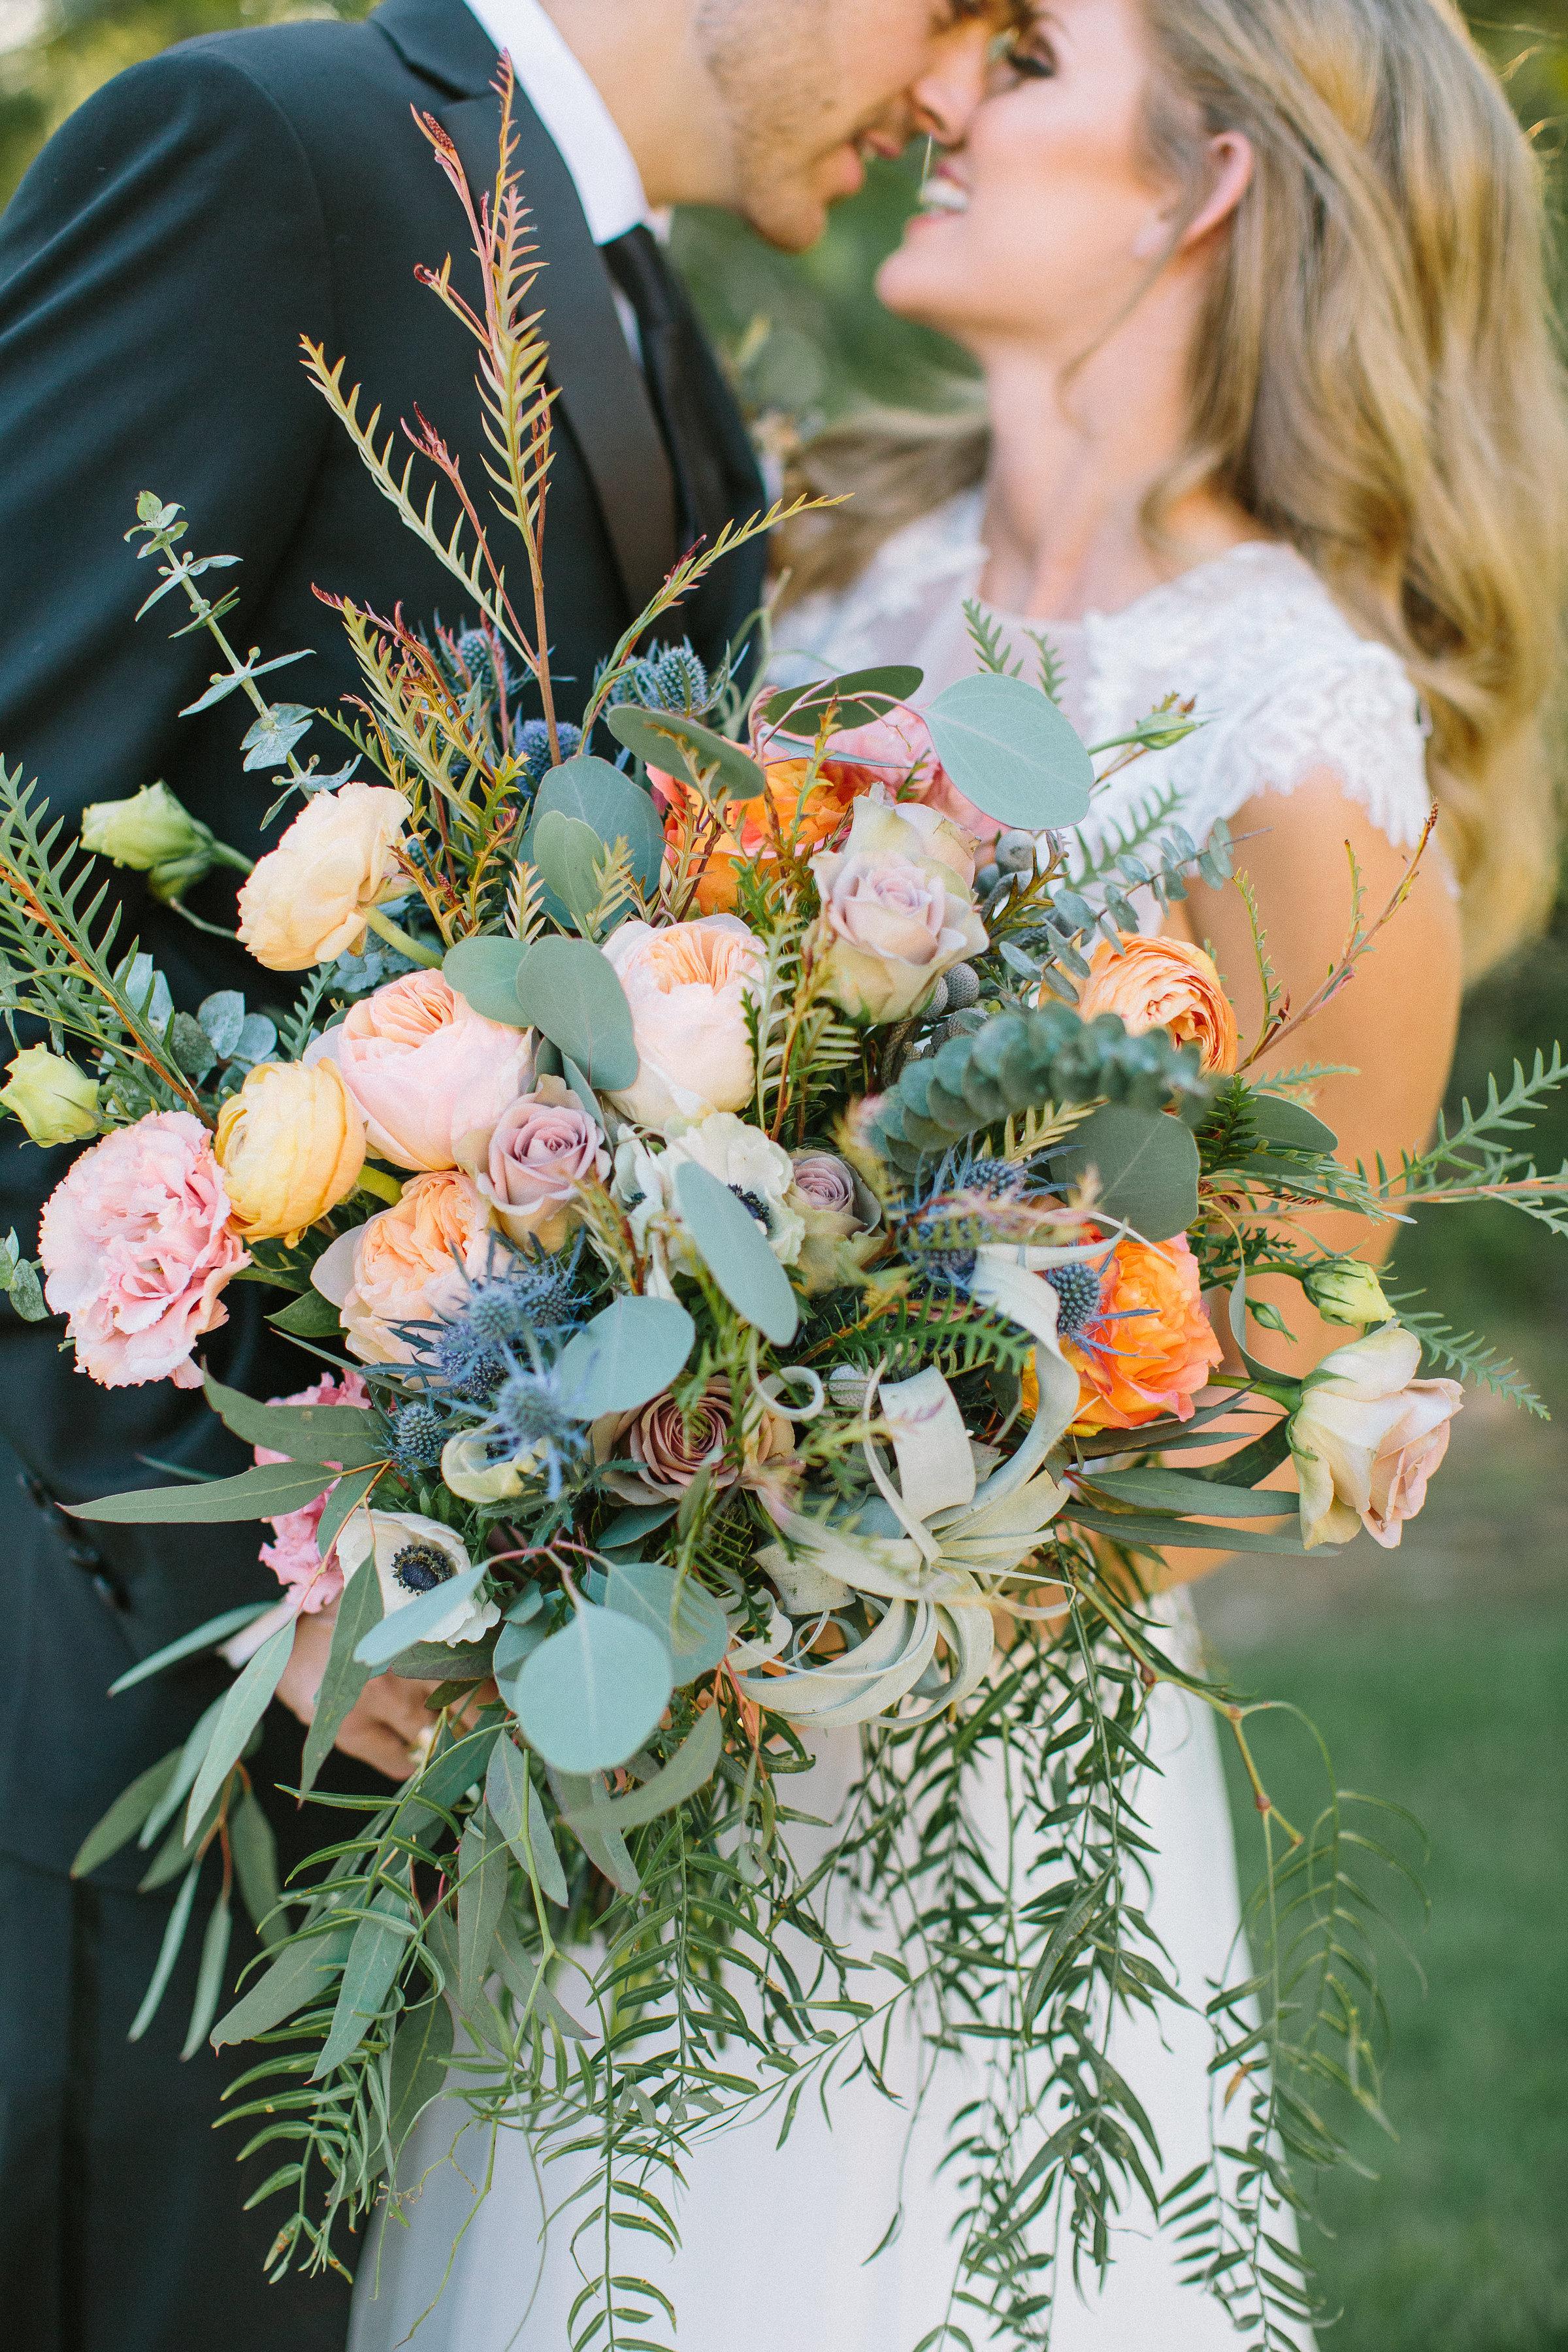 Ellen-Ashton-Photography-Peach-Creek-Ranch-Weddings-Wed-and-Prosper235